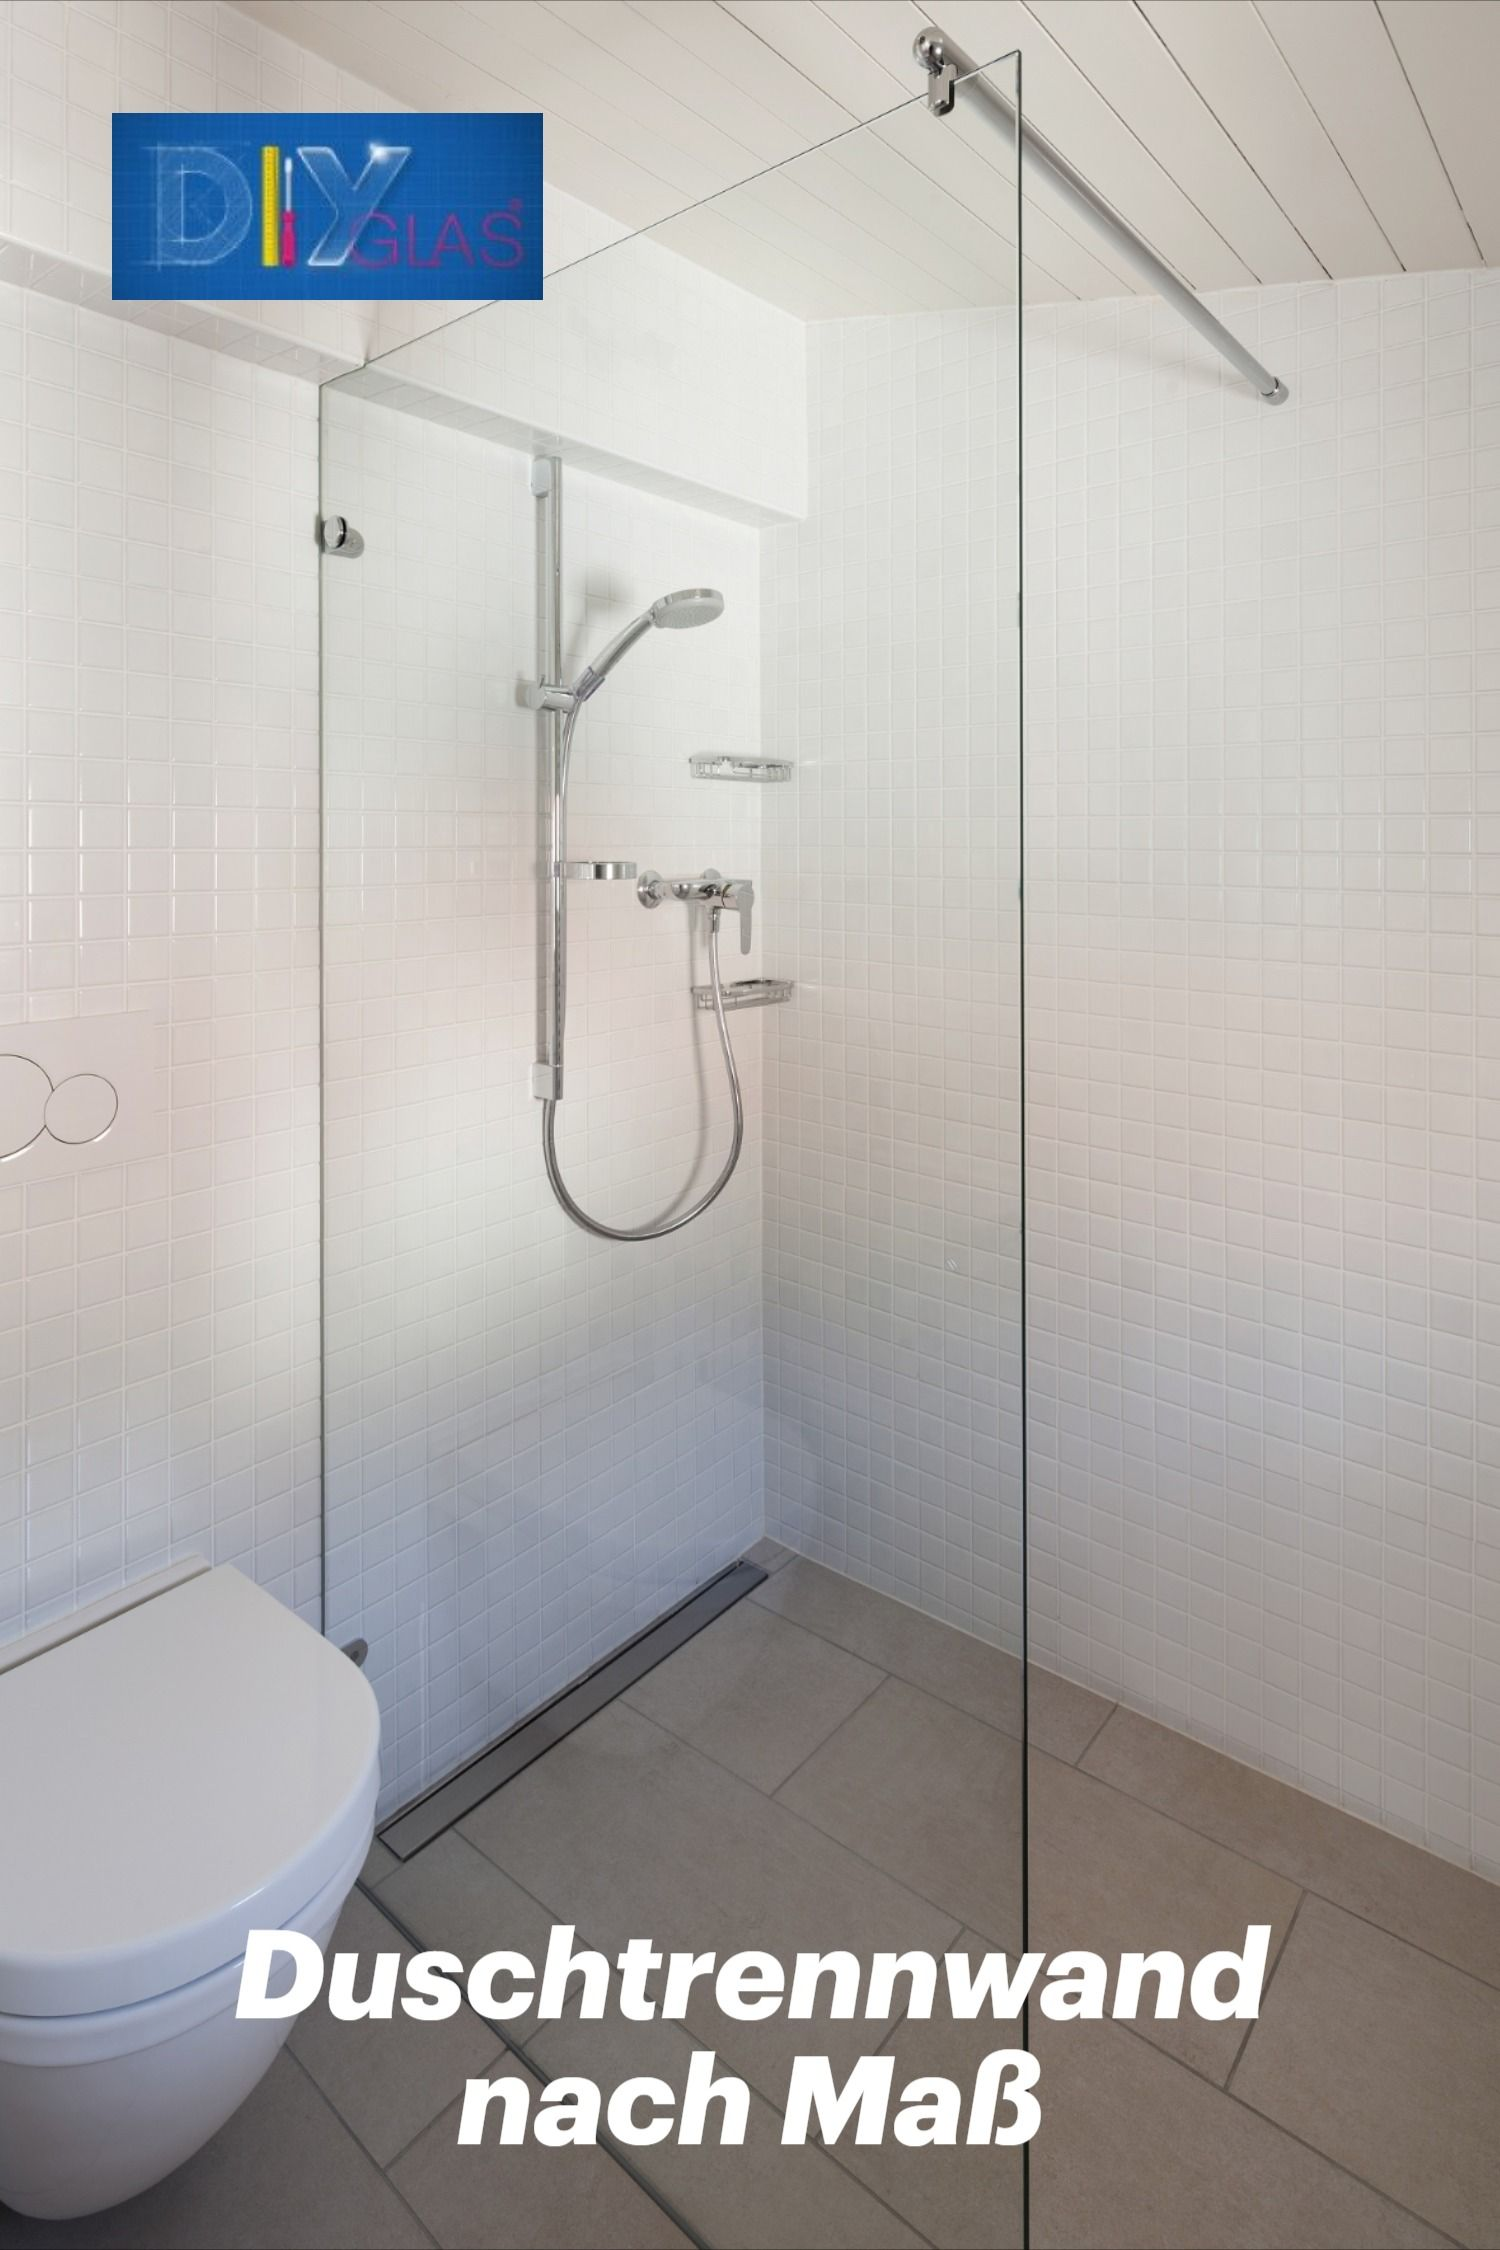 Badewannenaufsatz Badewannen Faltwand Duschabtrennung Duschwand U Form Nicla Ebay Duschabtrennung Duschabtrennung Badewanne Badewanne